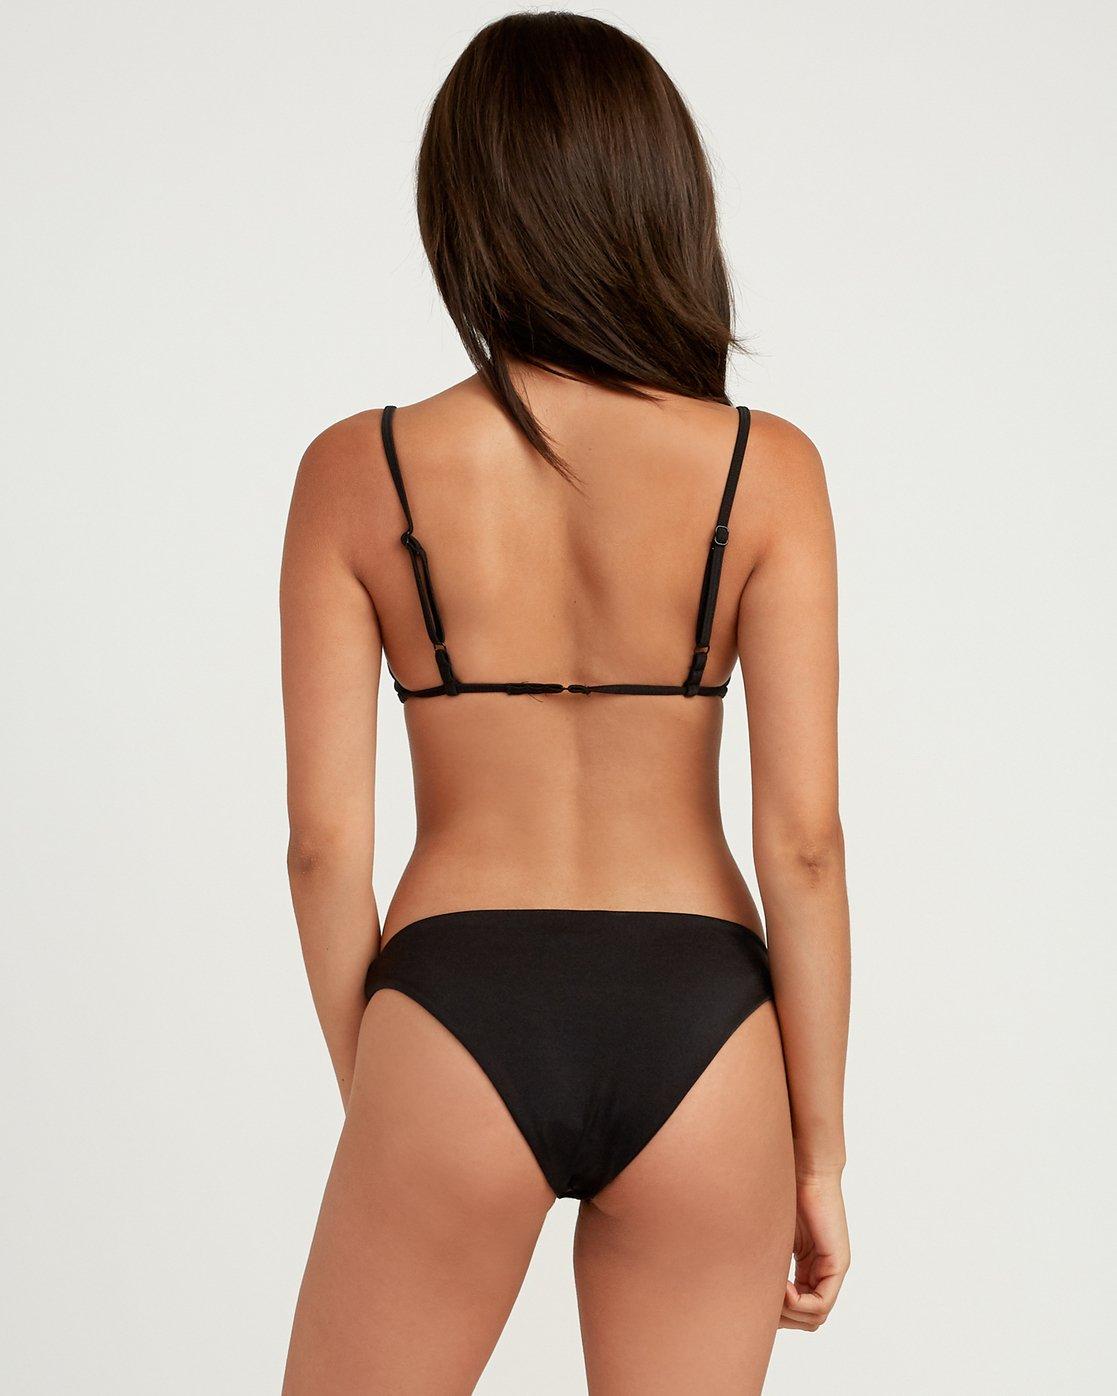 4c78388e76 0 Solid Shimmer Medium Bikini Bottoms Black XB21QRSM RVCA